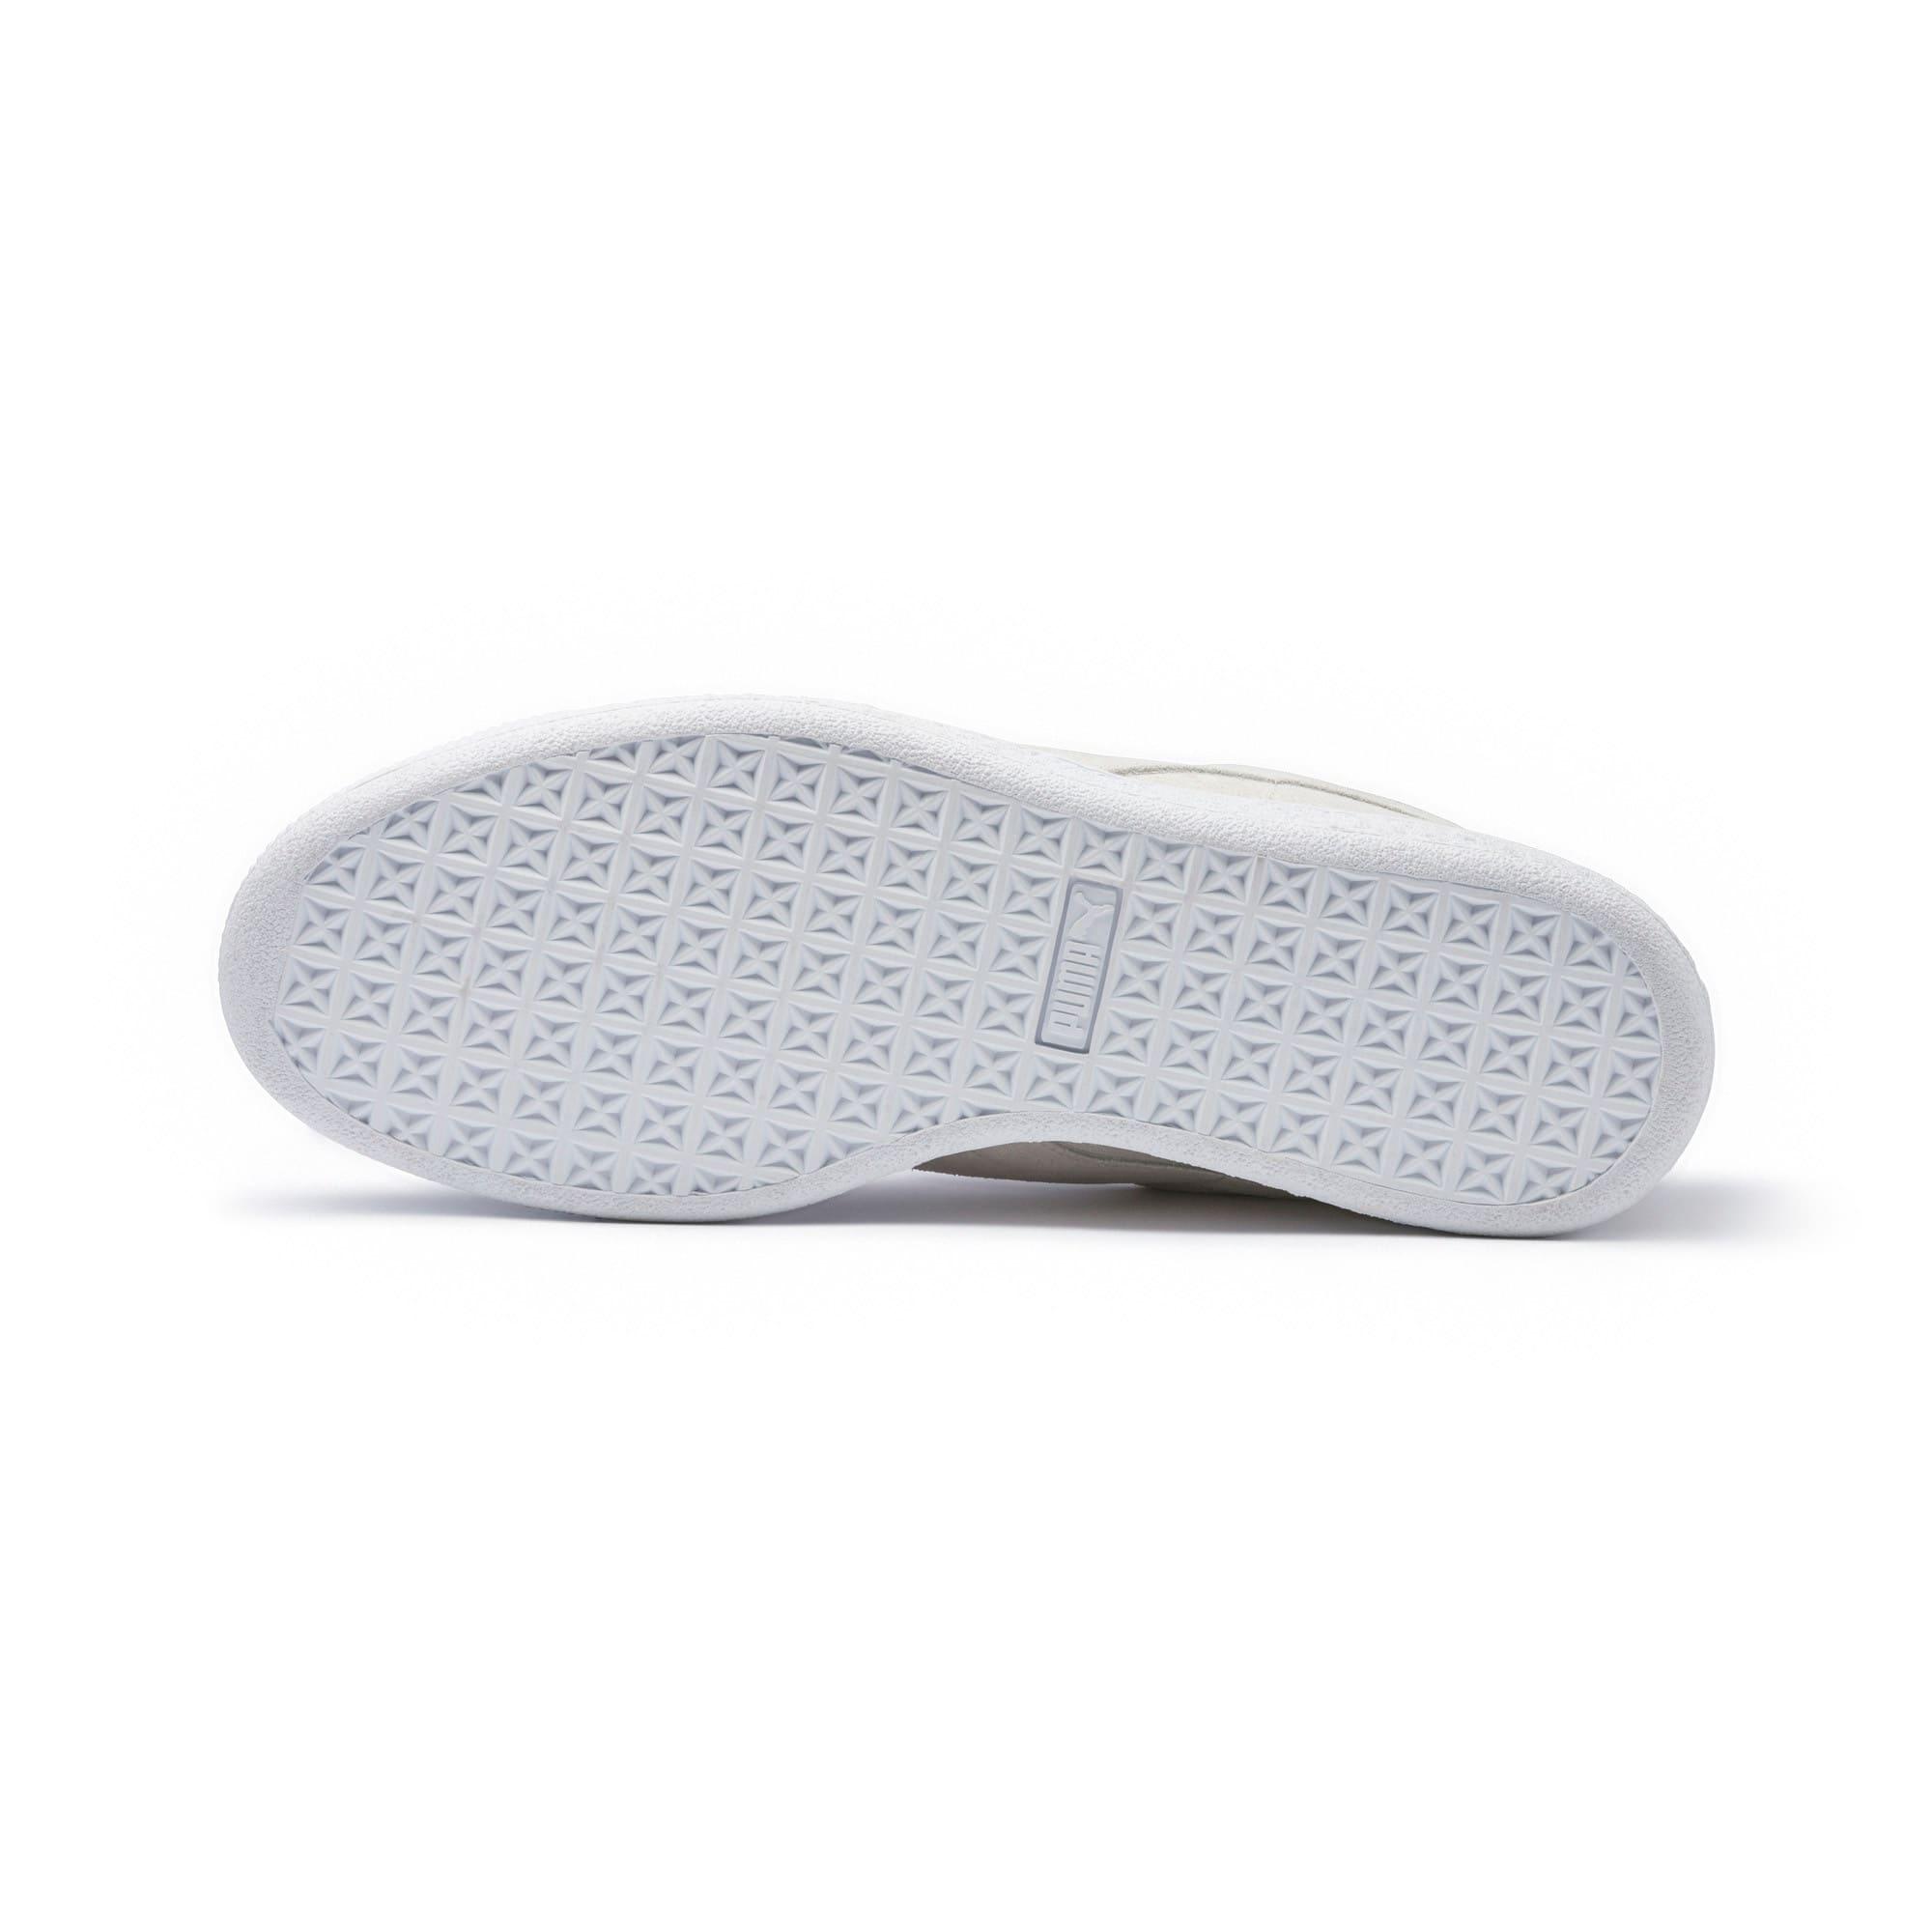 Thumbnail 3 of Suede Classic White Sneakers, Puma White-Puma White, medium